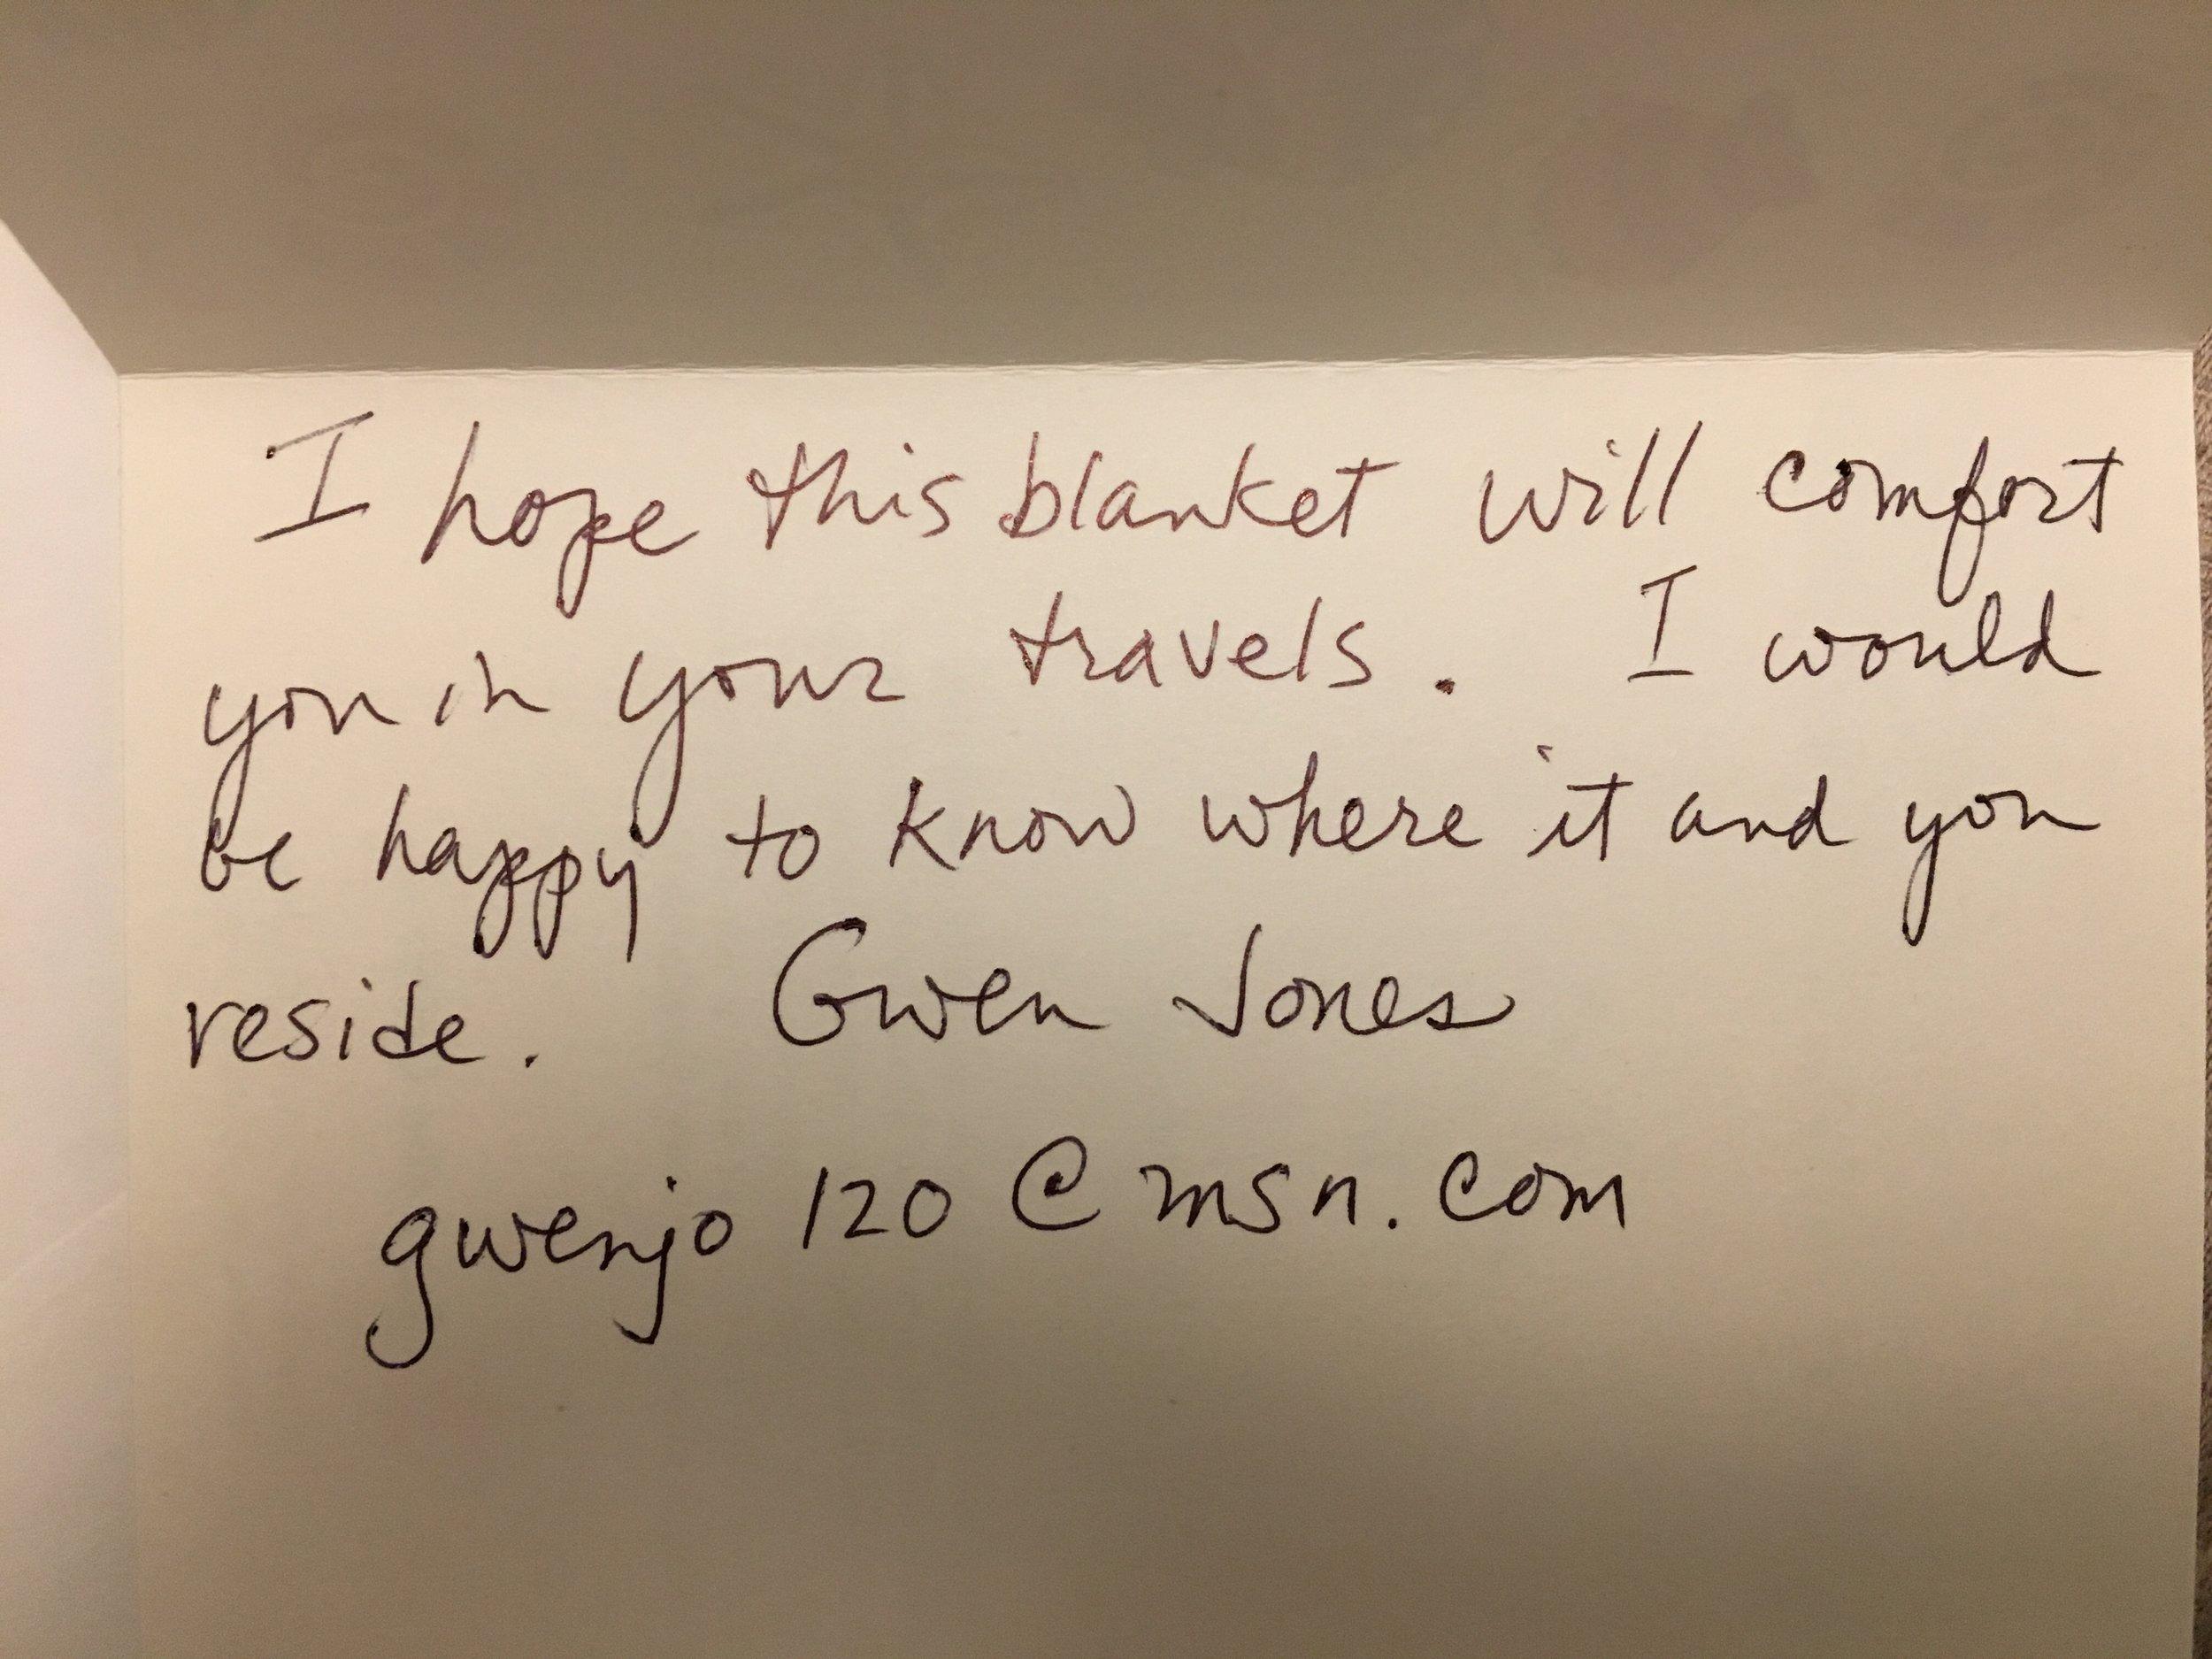 Gwen Jones - New York, NY